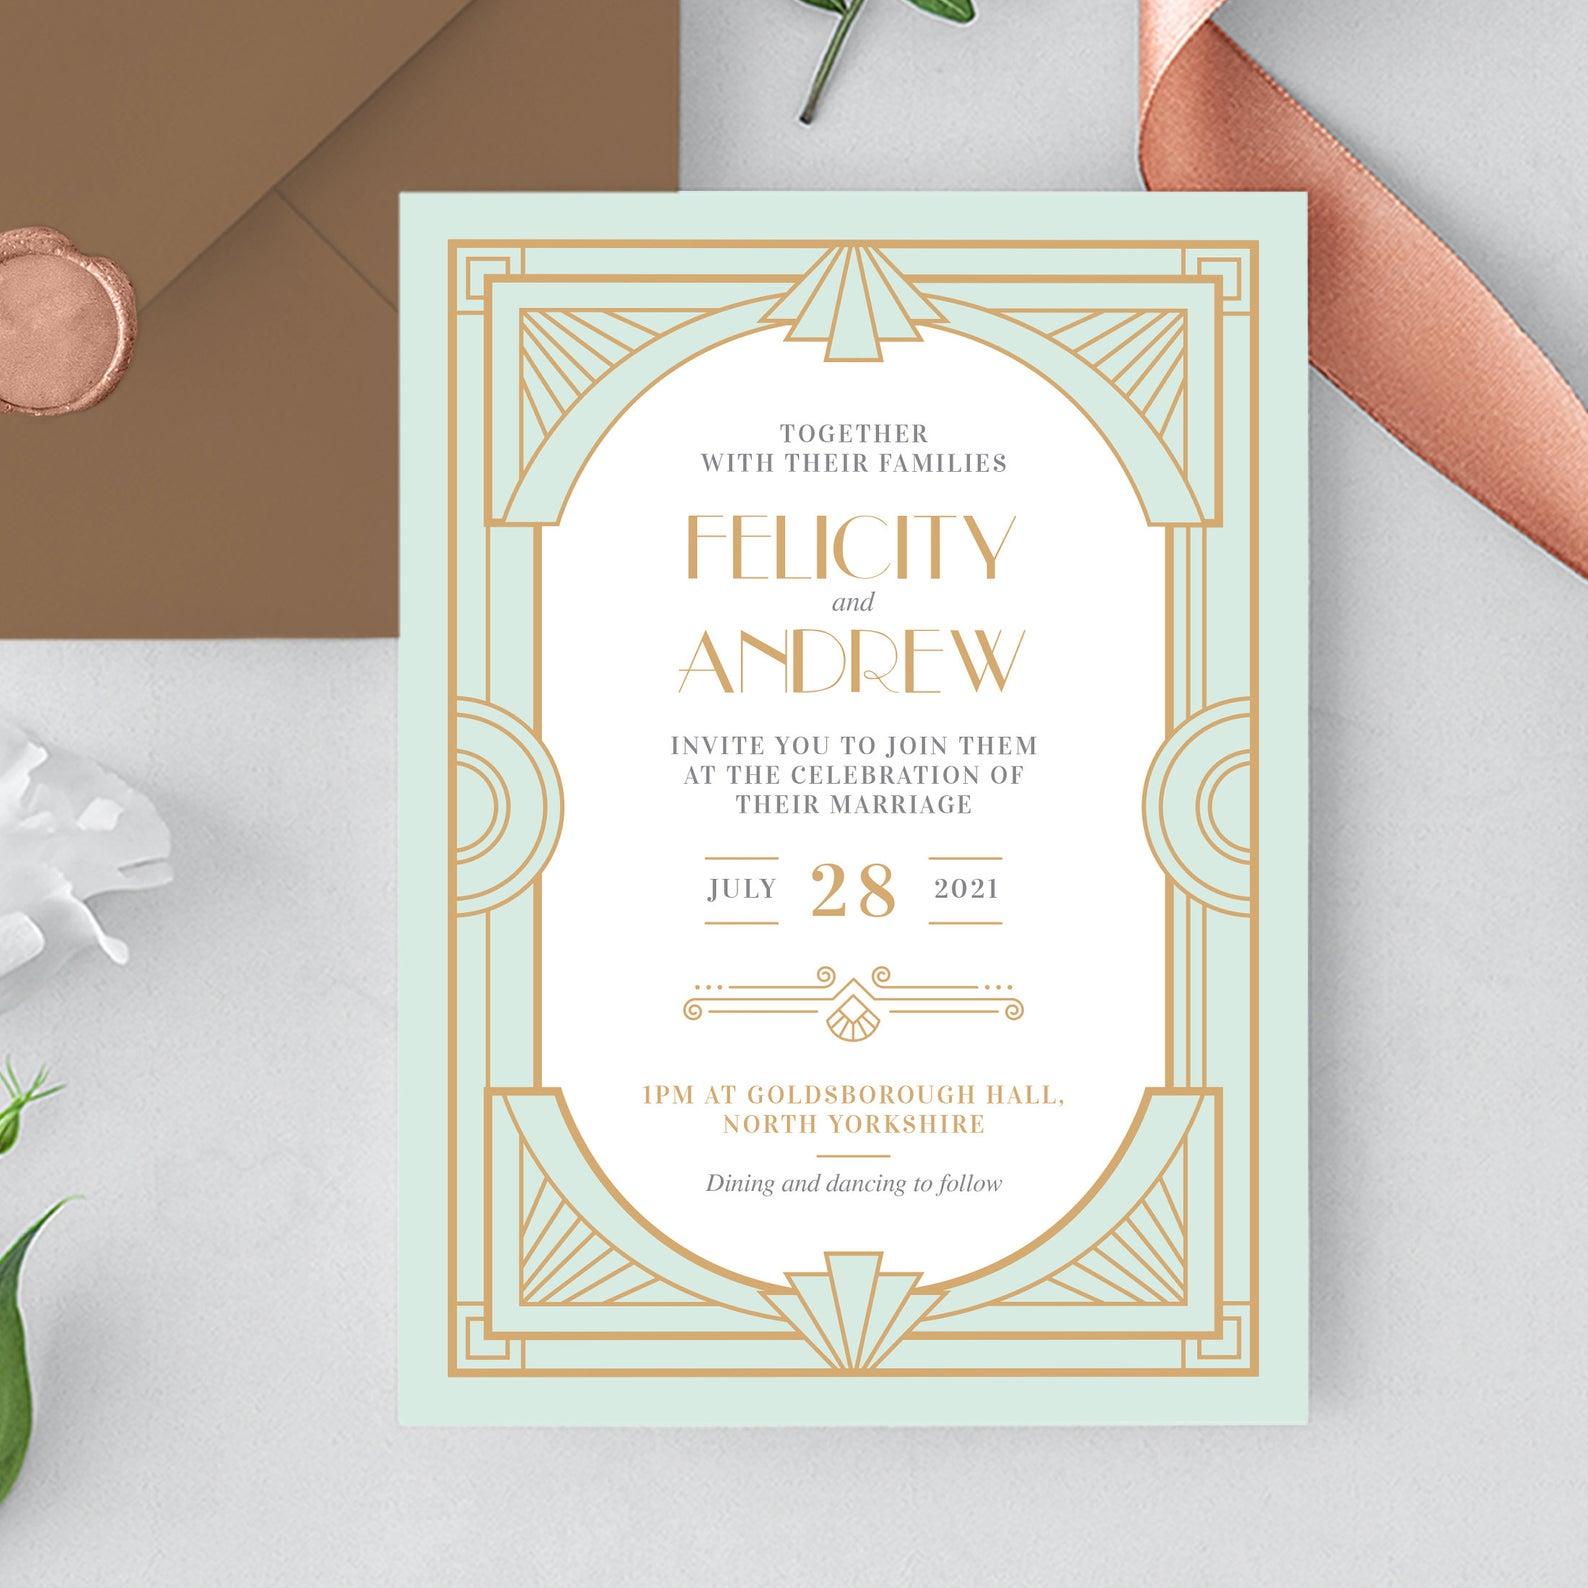 Vintage Wedding Invitation Roaring 20s Wedding Invitation Template Gatsby Deco Wedding Invitations Art Deco Wedding Invitations Vintage Wedding Invitations